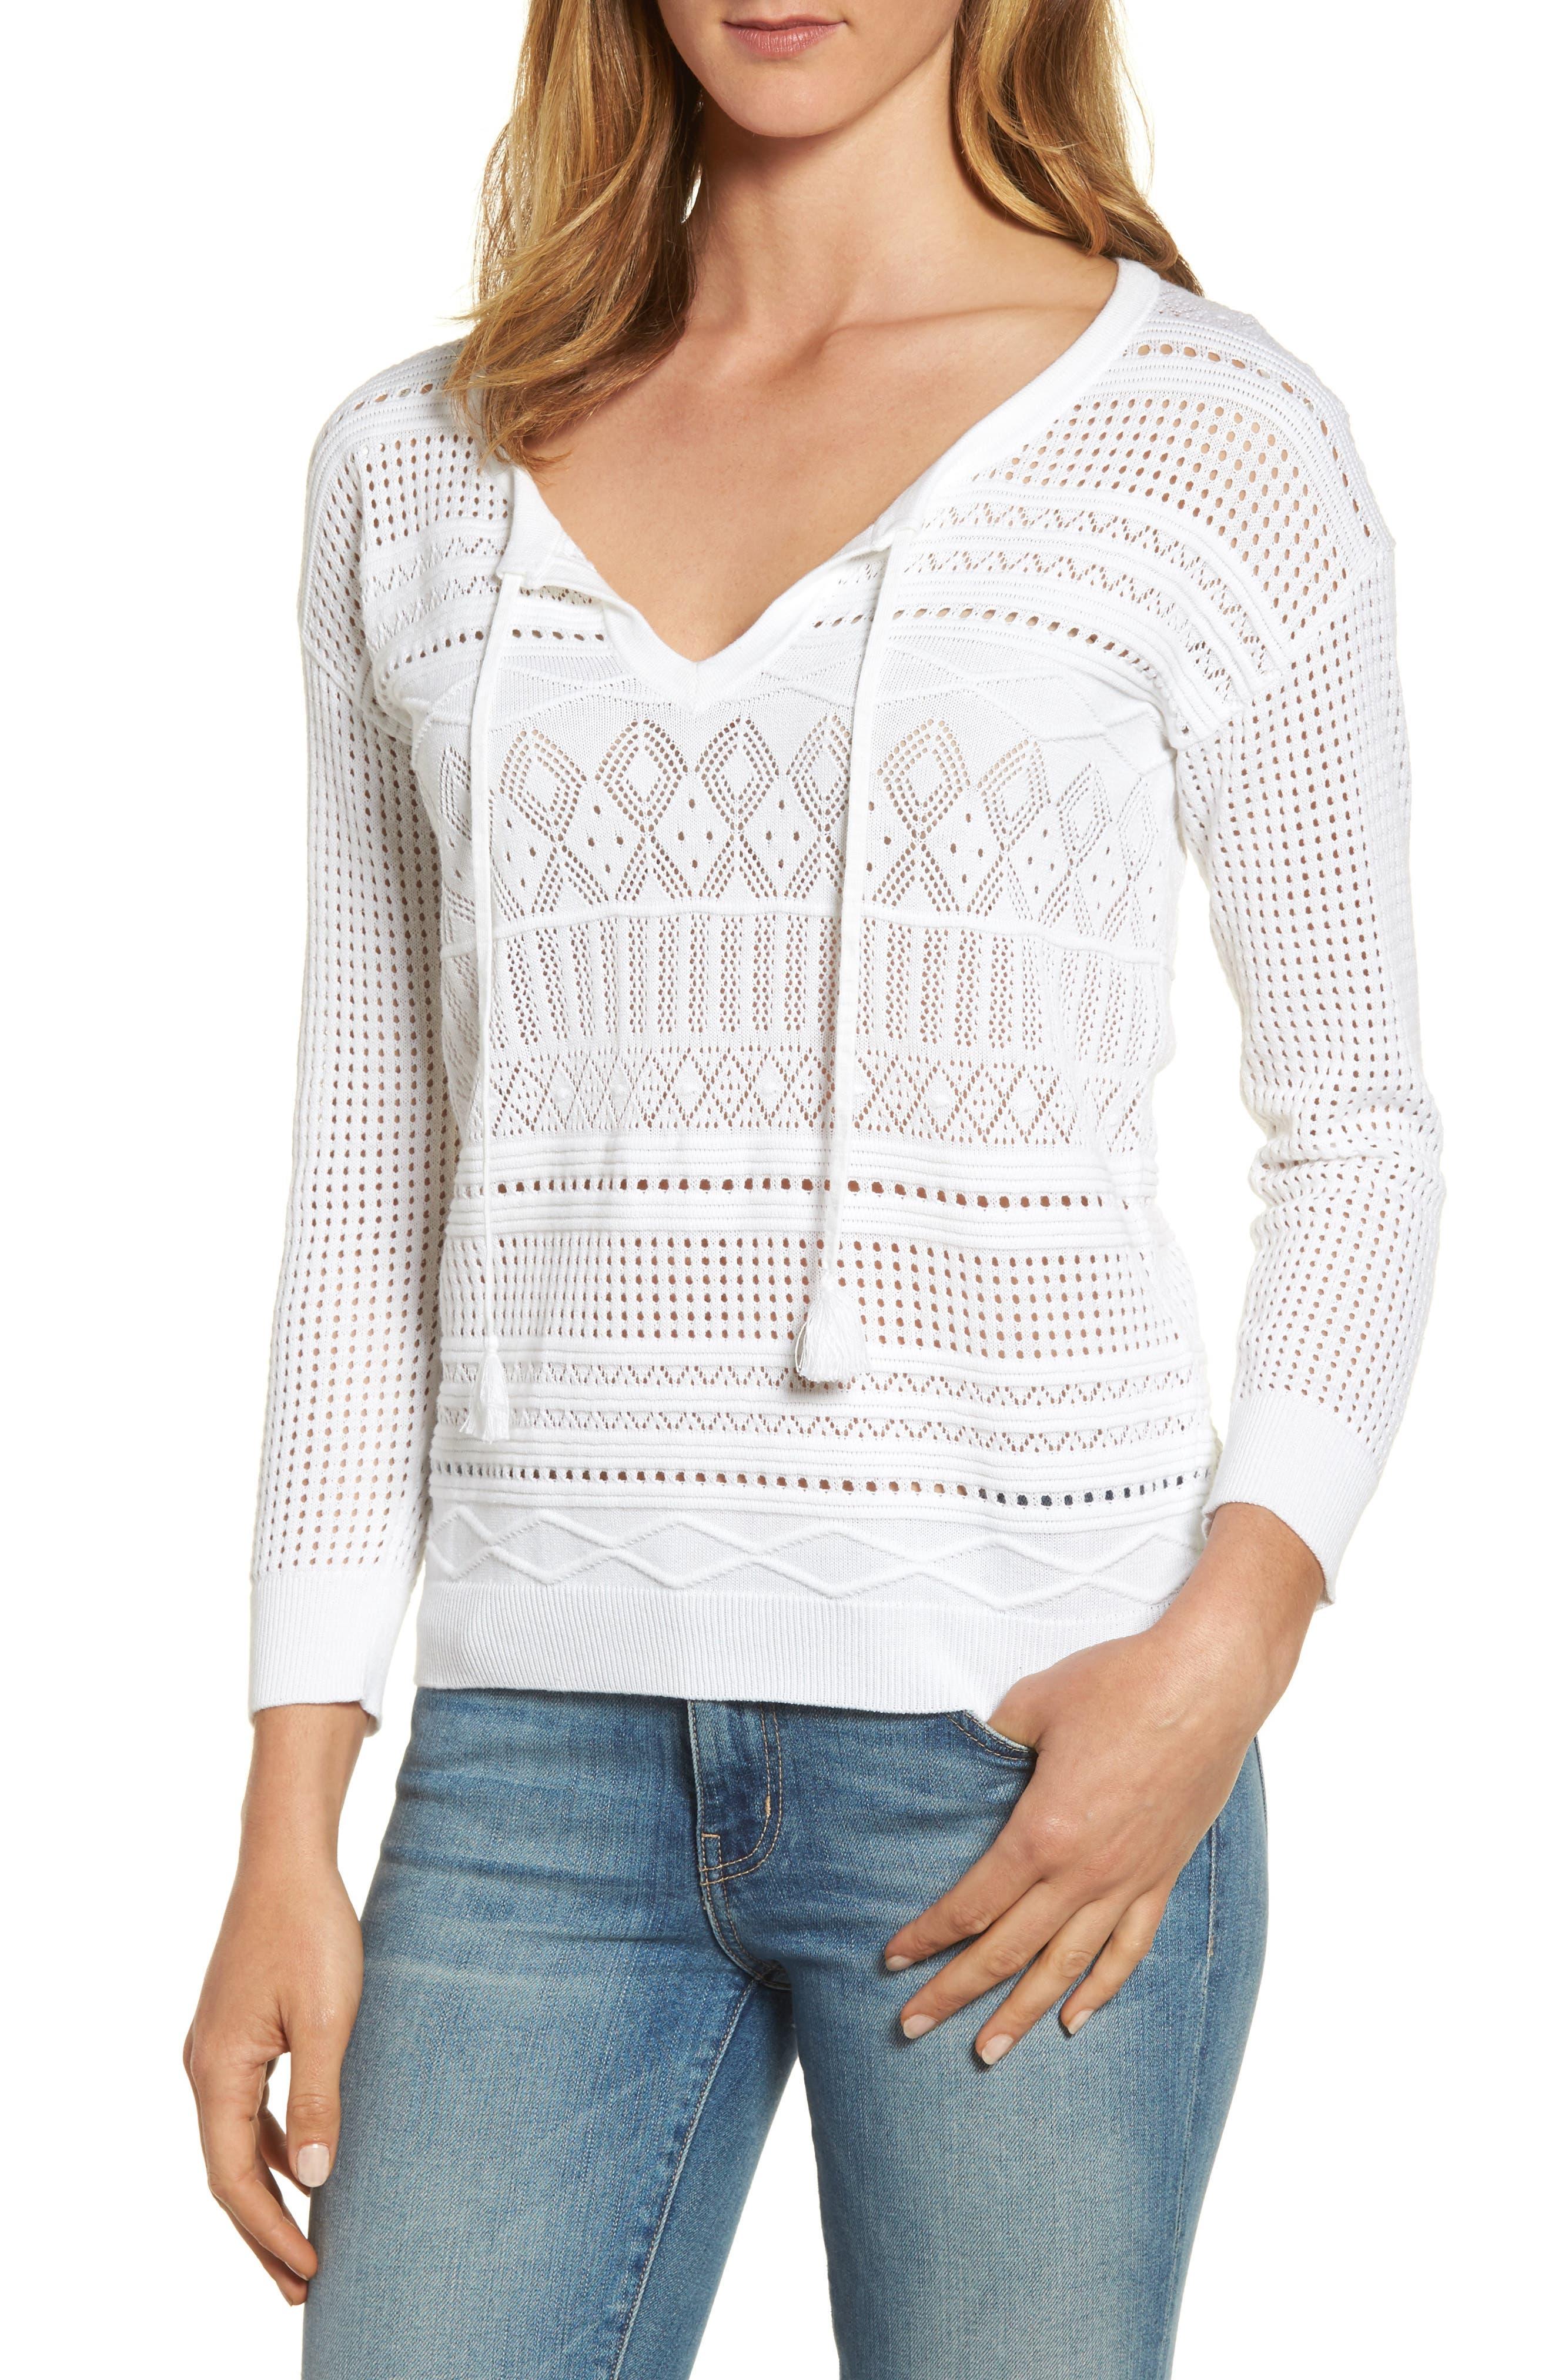 Main Image - Tommy Bahama Pickford Pointelle Split Neck Sweater